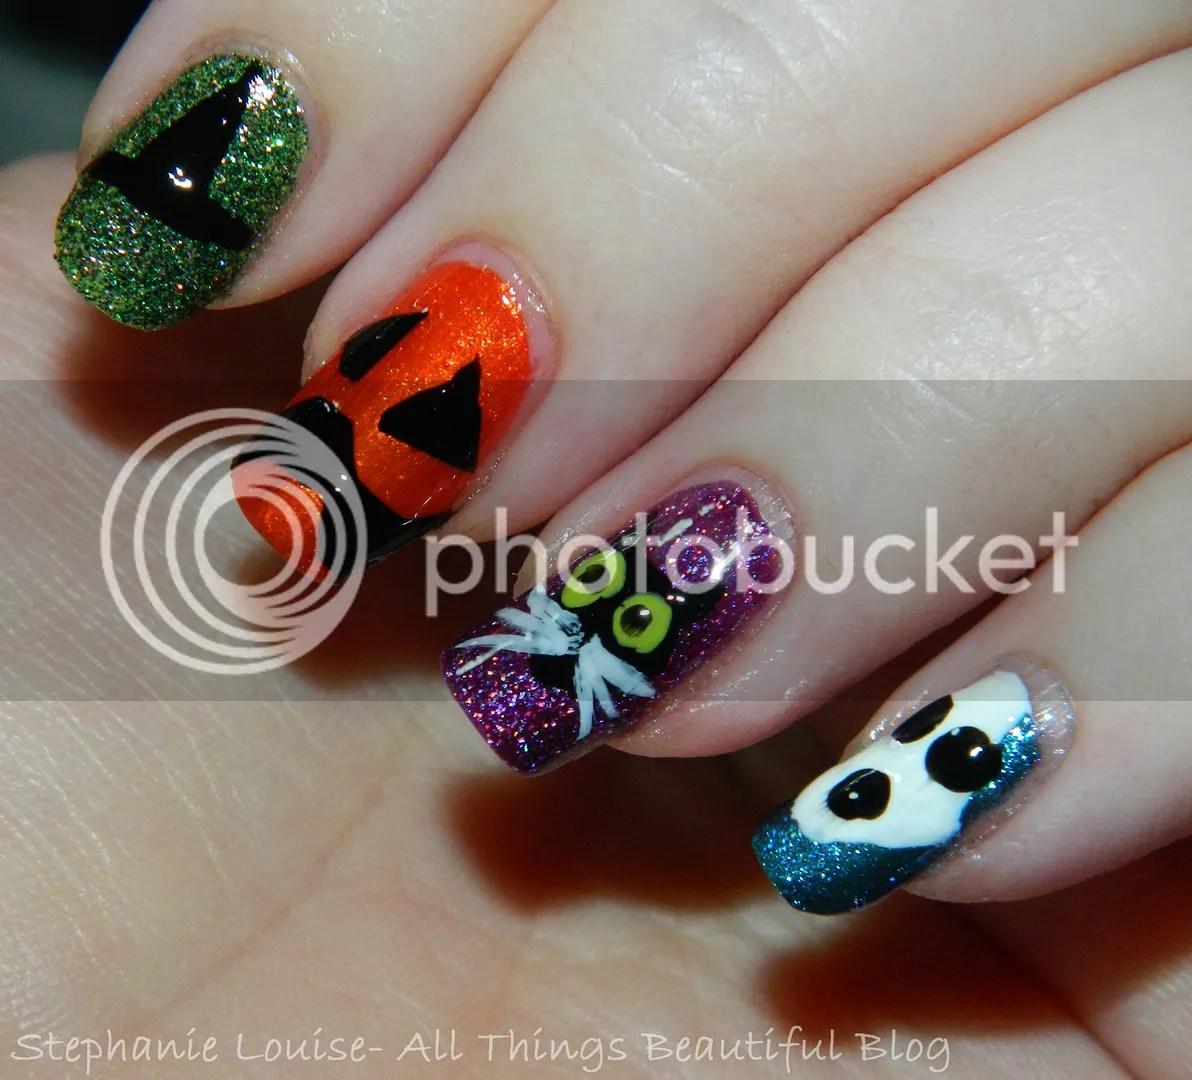 My Totally Random & Fun Easy Halloween Nail Art! - All ...